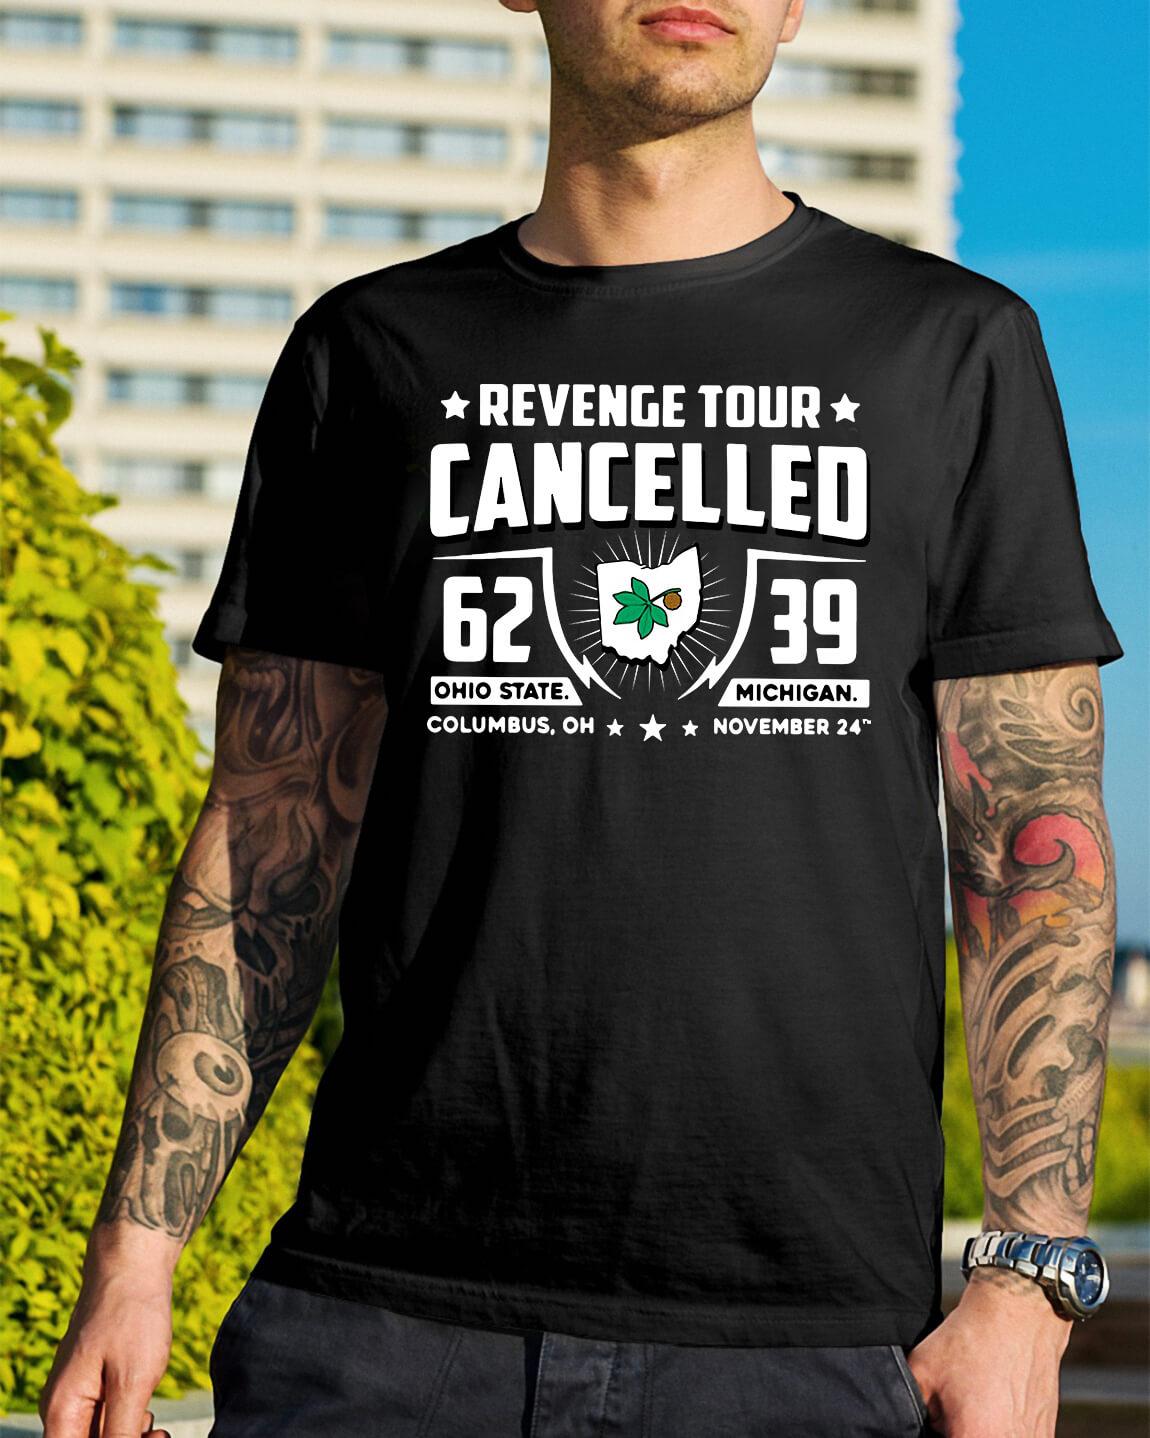 7259e699 Revenge tour Cancelled 62 39 Ohio State vs Michigan shirt, hoodie